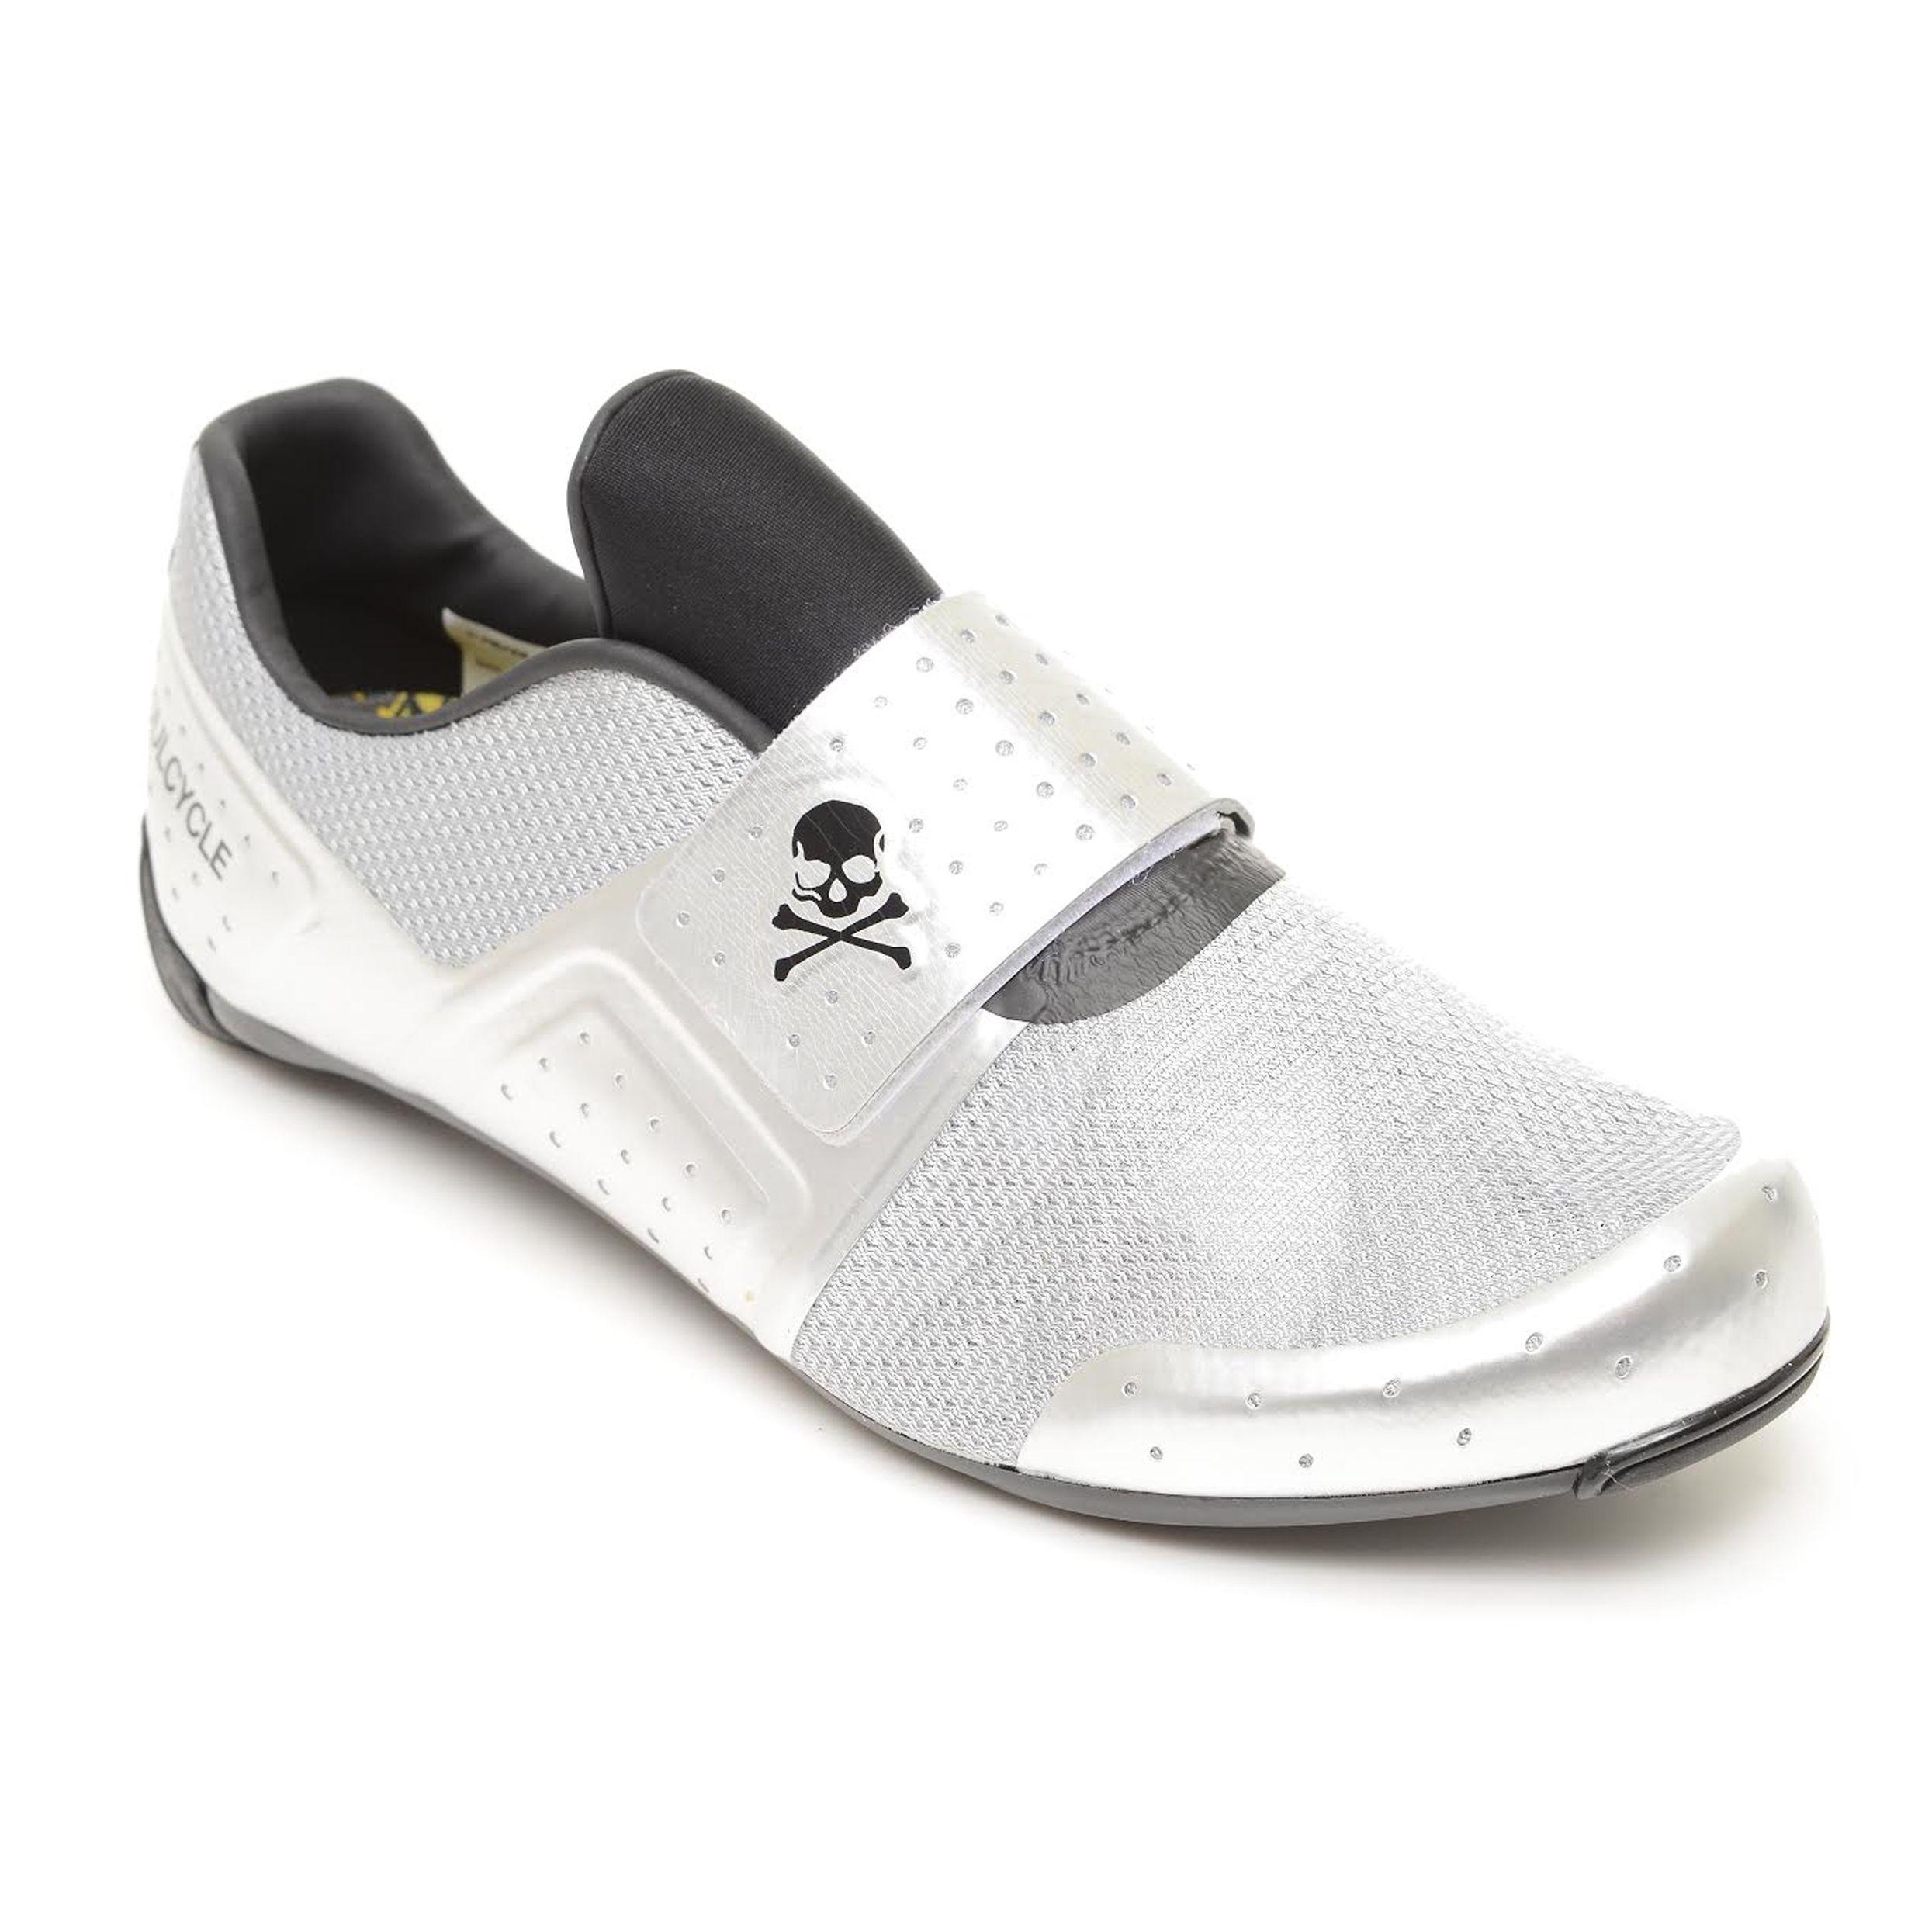 Sales Promotio Adidas Running Shoes WhiteBlackOnix Men's